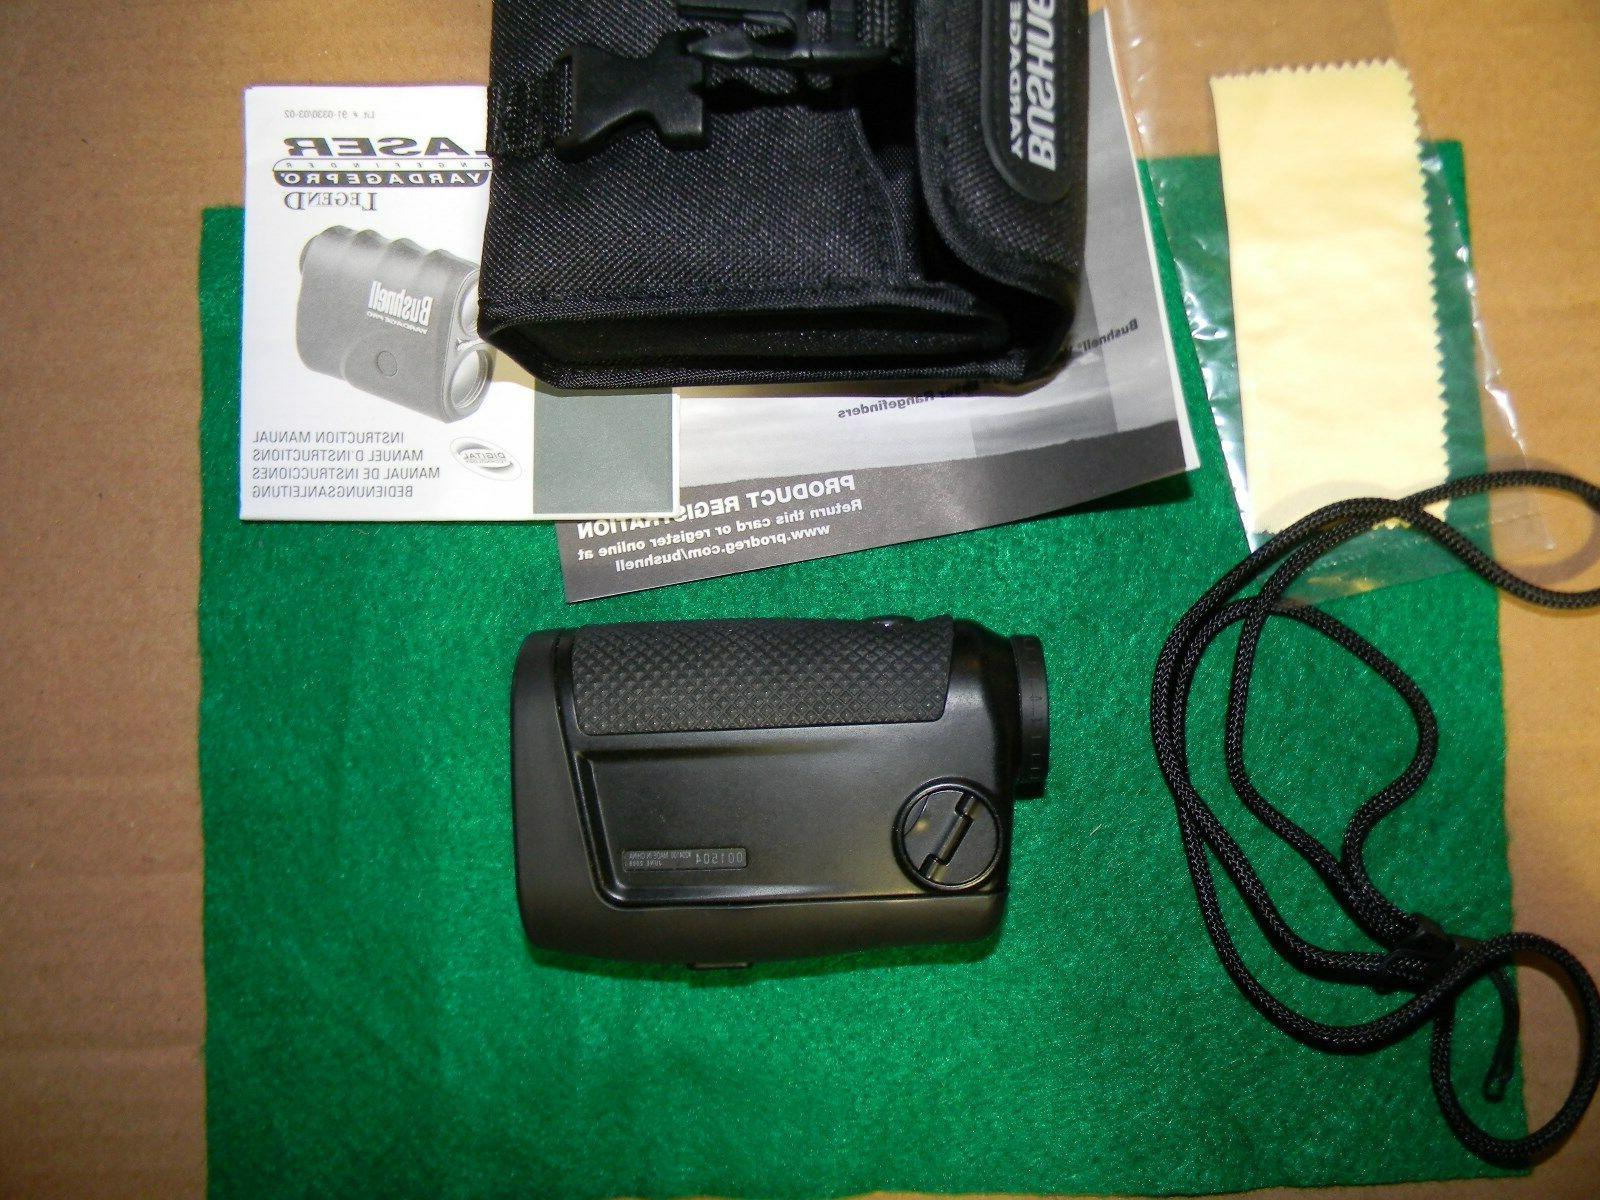 Bushnell Yardage Pro Laser Rangefinder #20-0003W